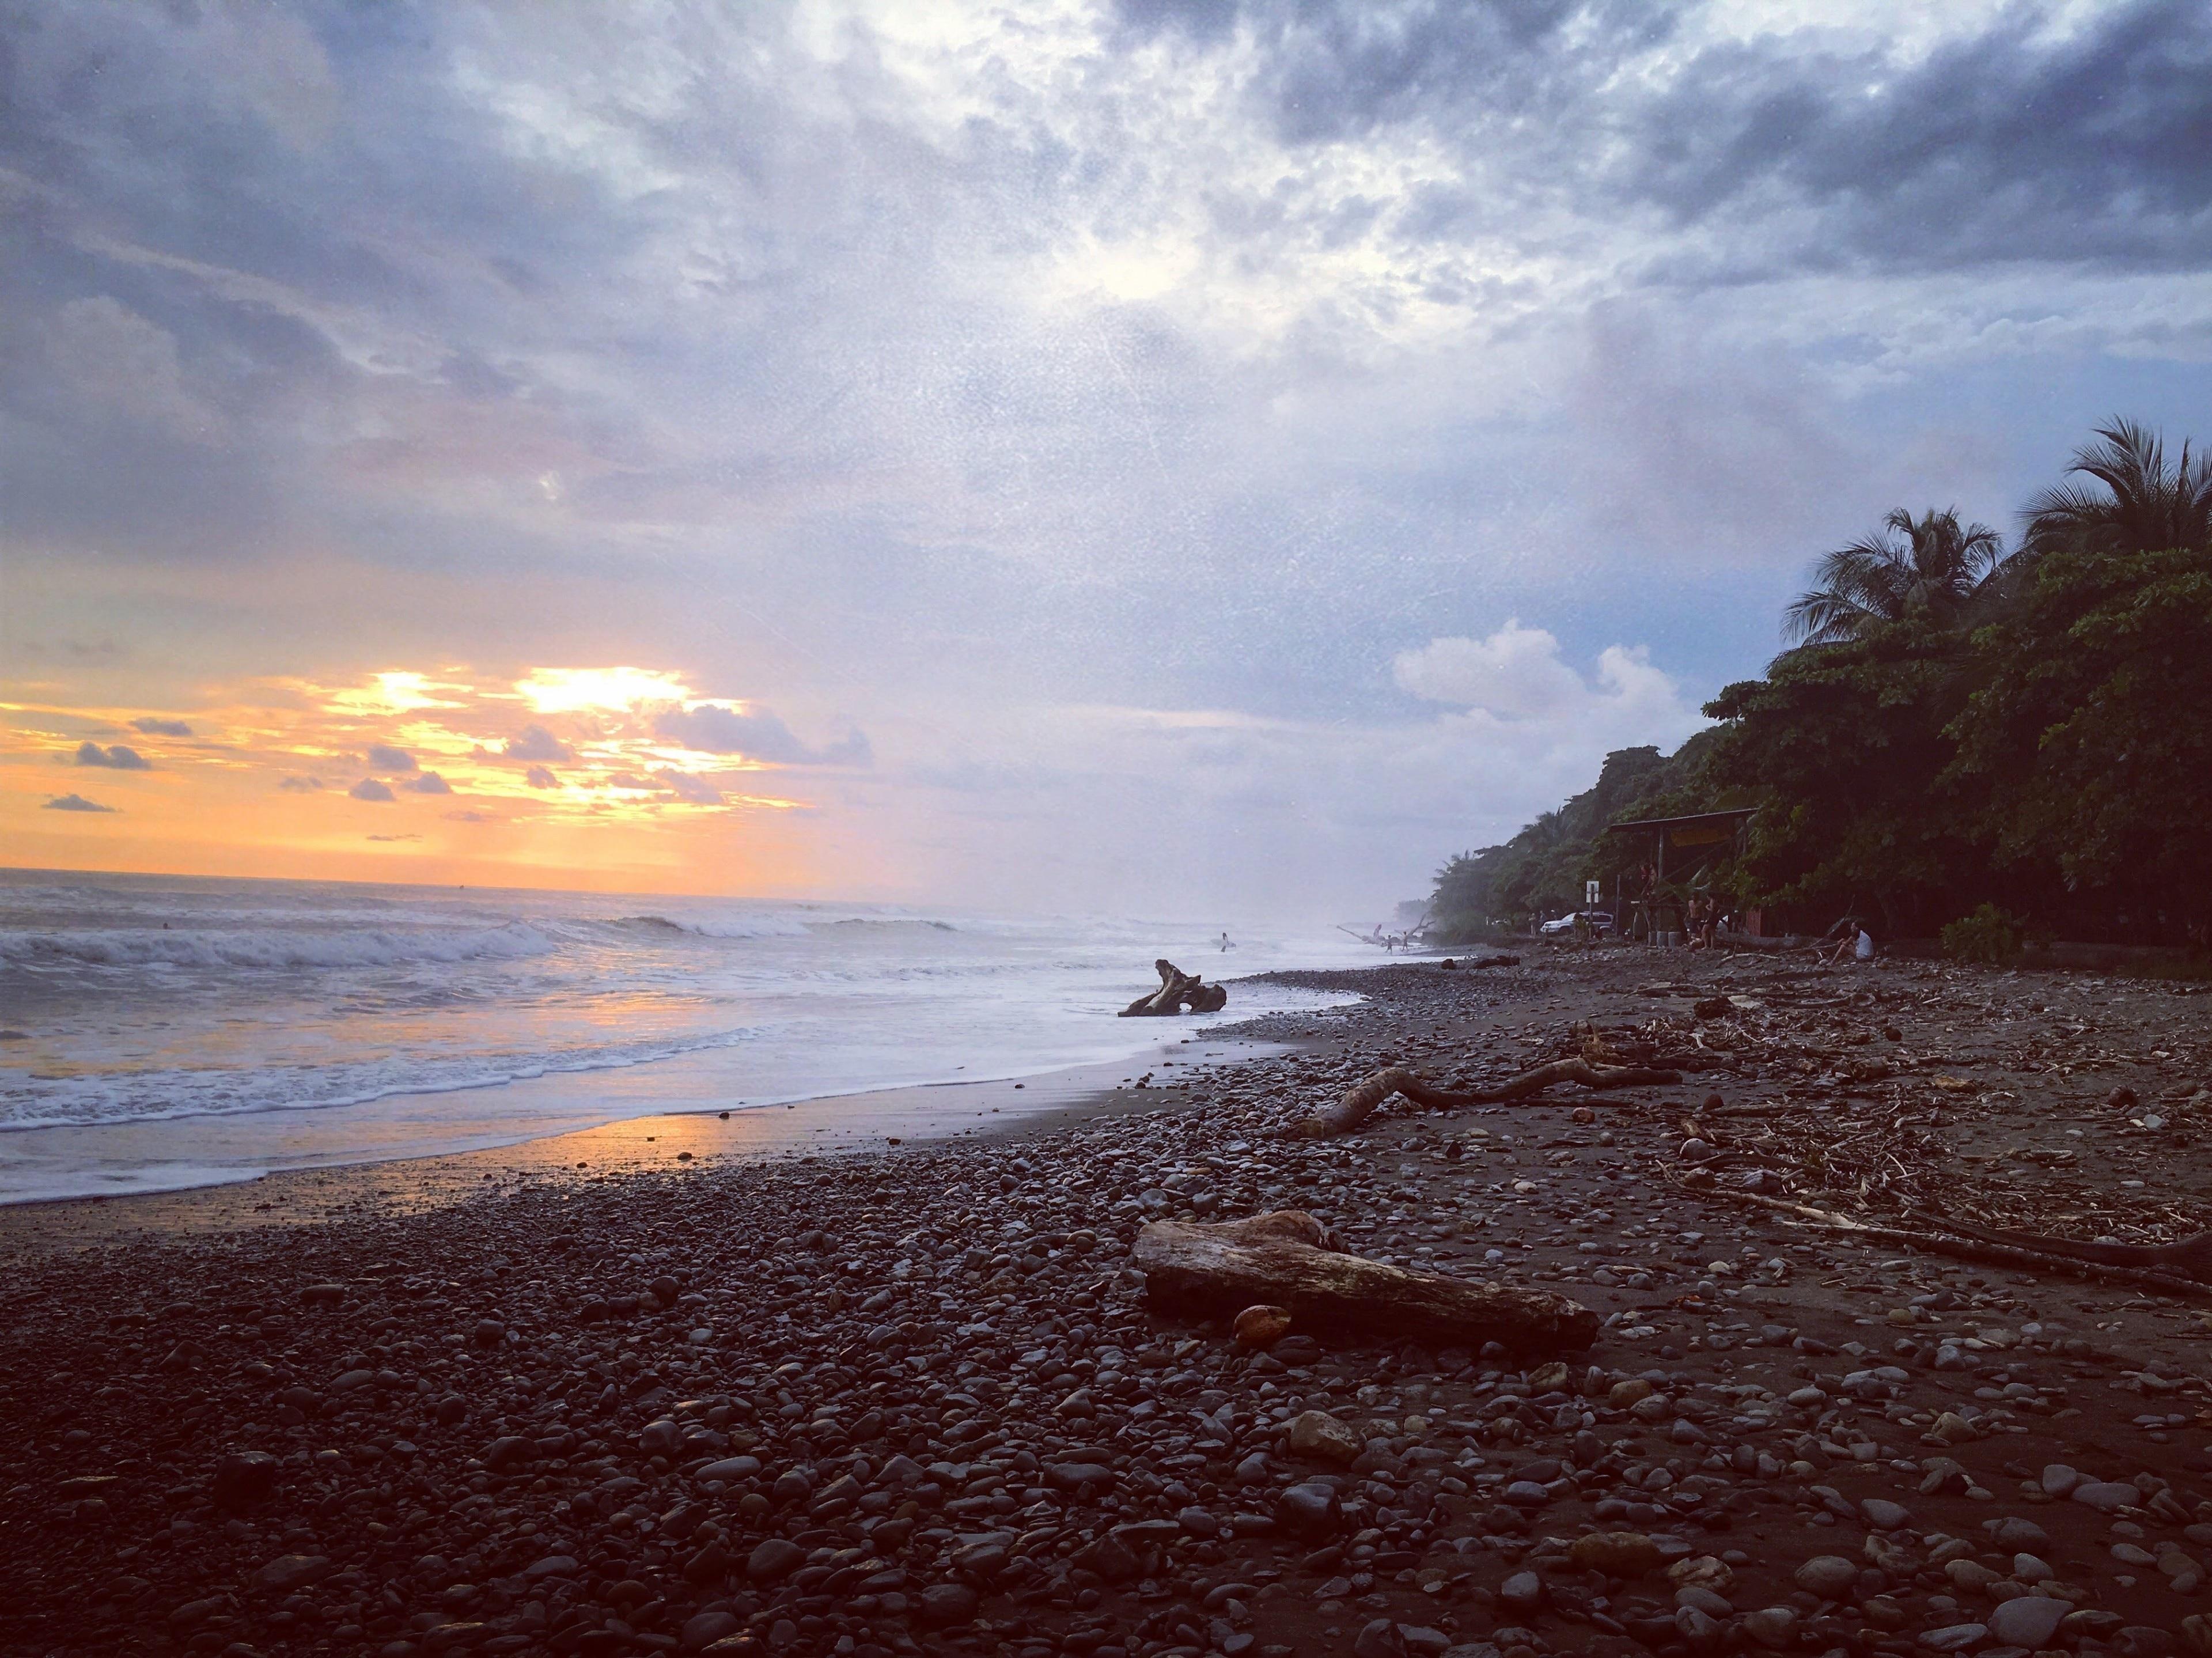 Dominicalito, Ballena, Puntarenas Province, Costa Rica